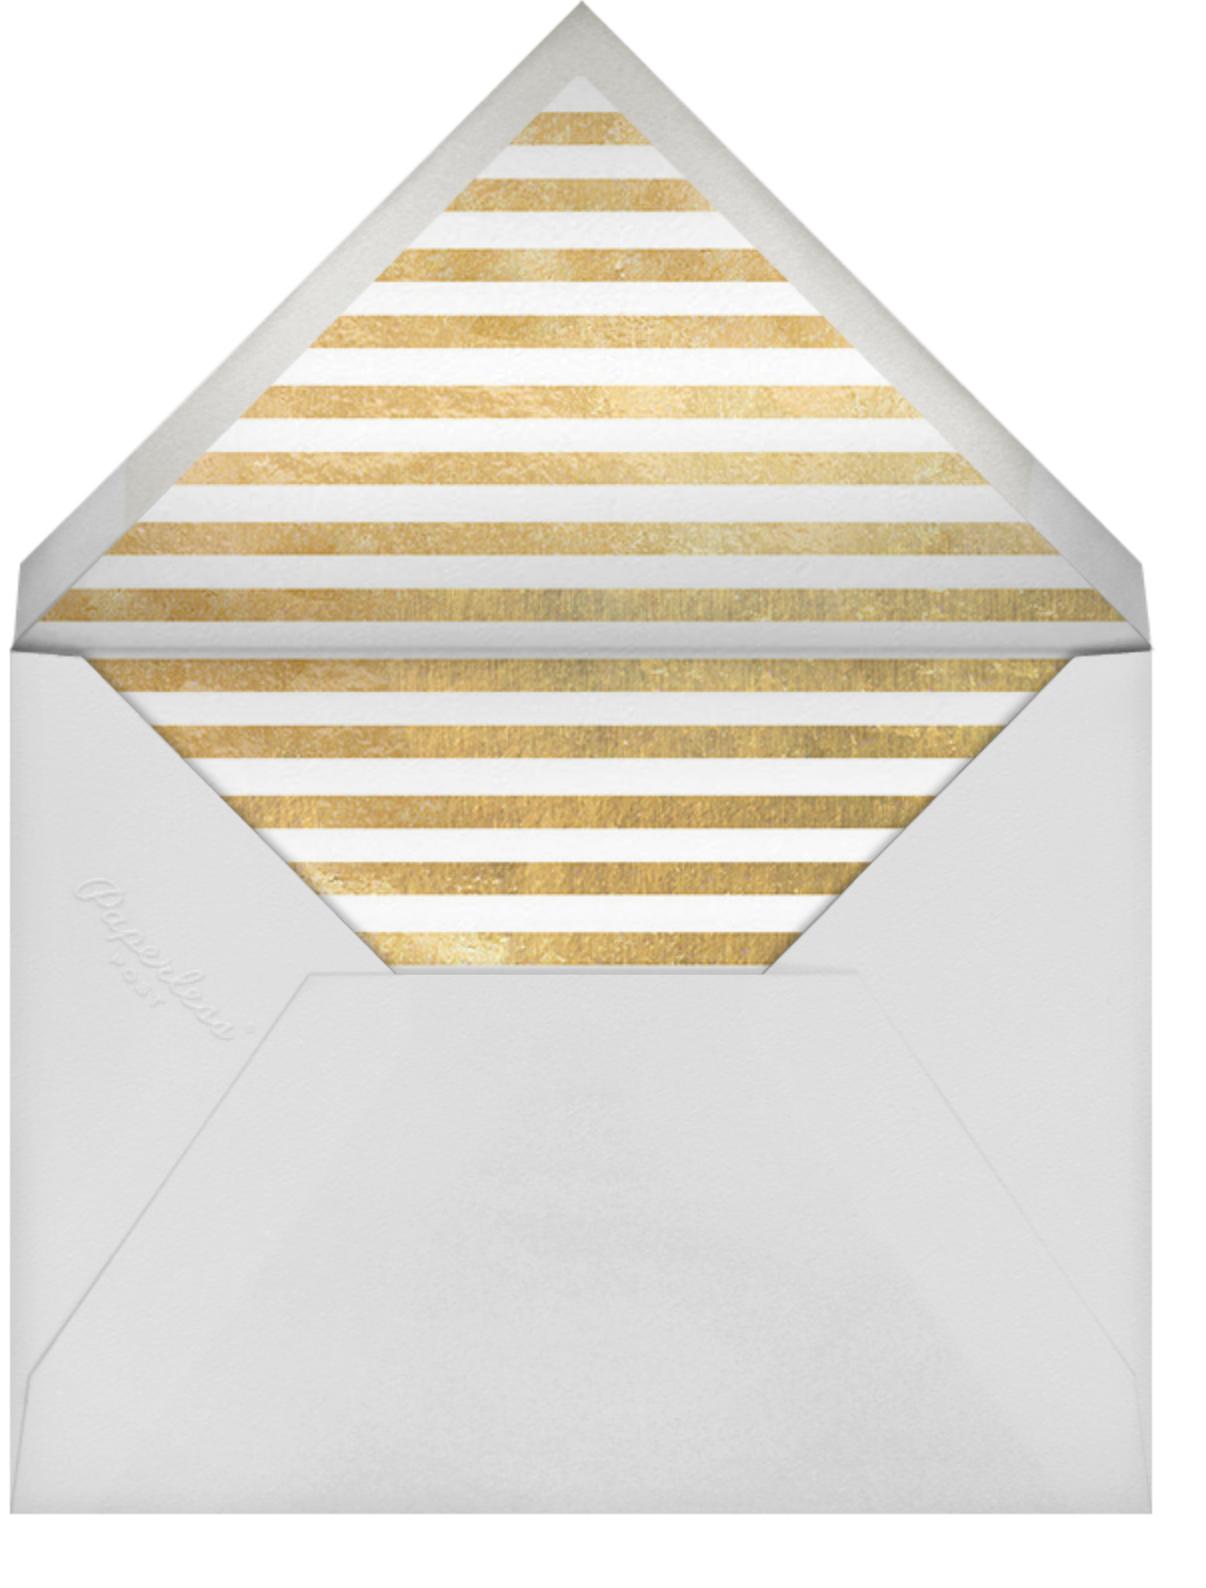 Prism - Blue - kate spade new york - Save the date - envelope back